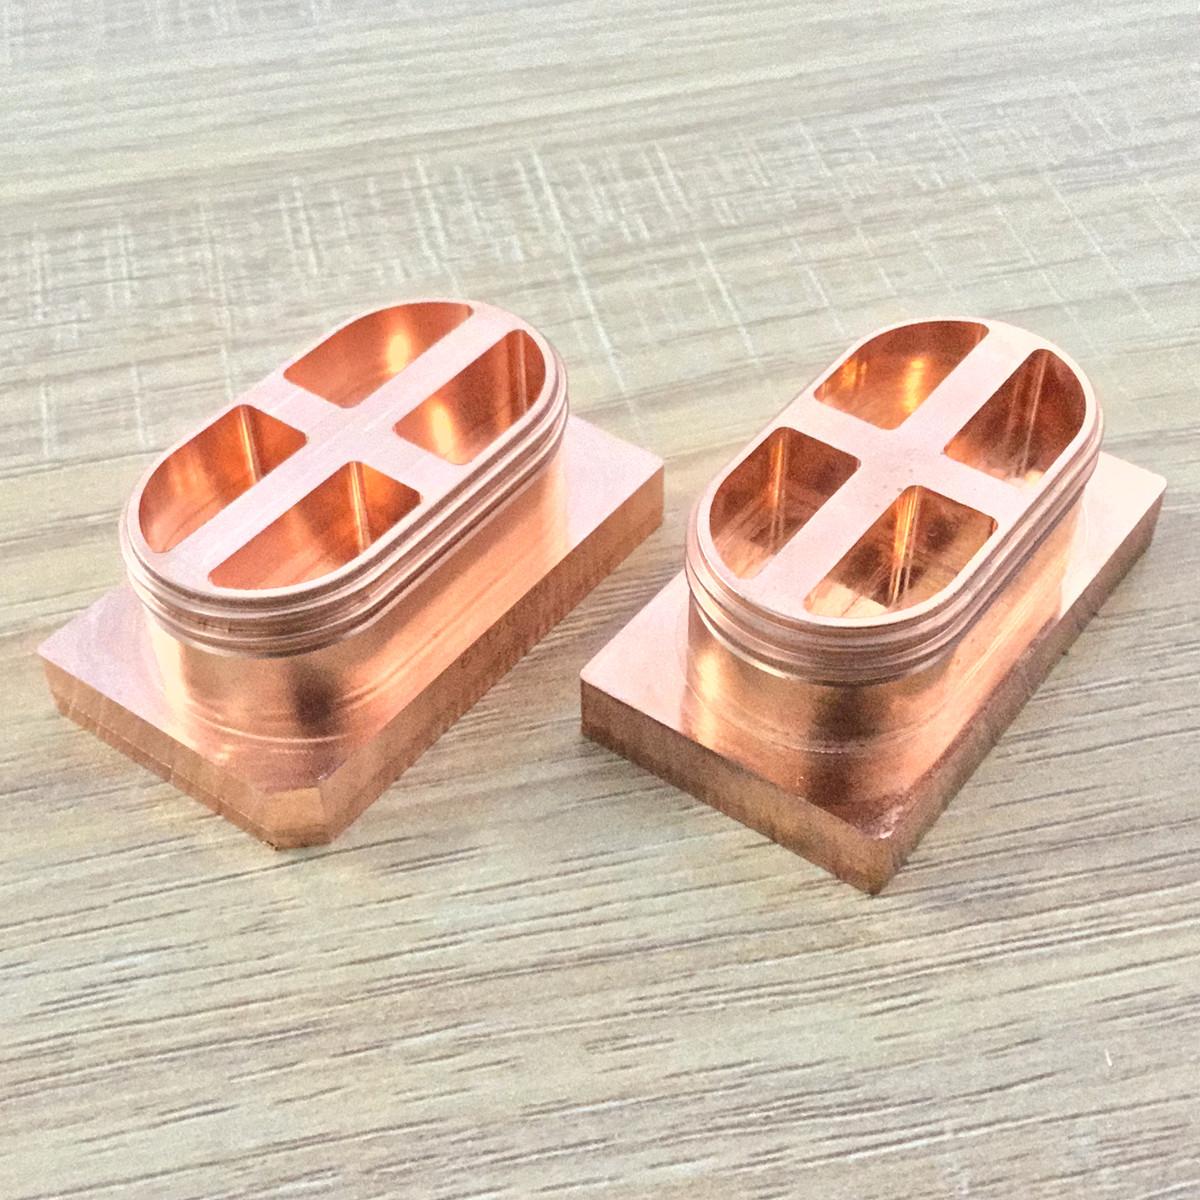 CNC 5-Axis machining electroplating rapid prototype